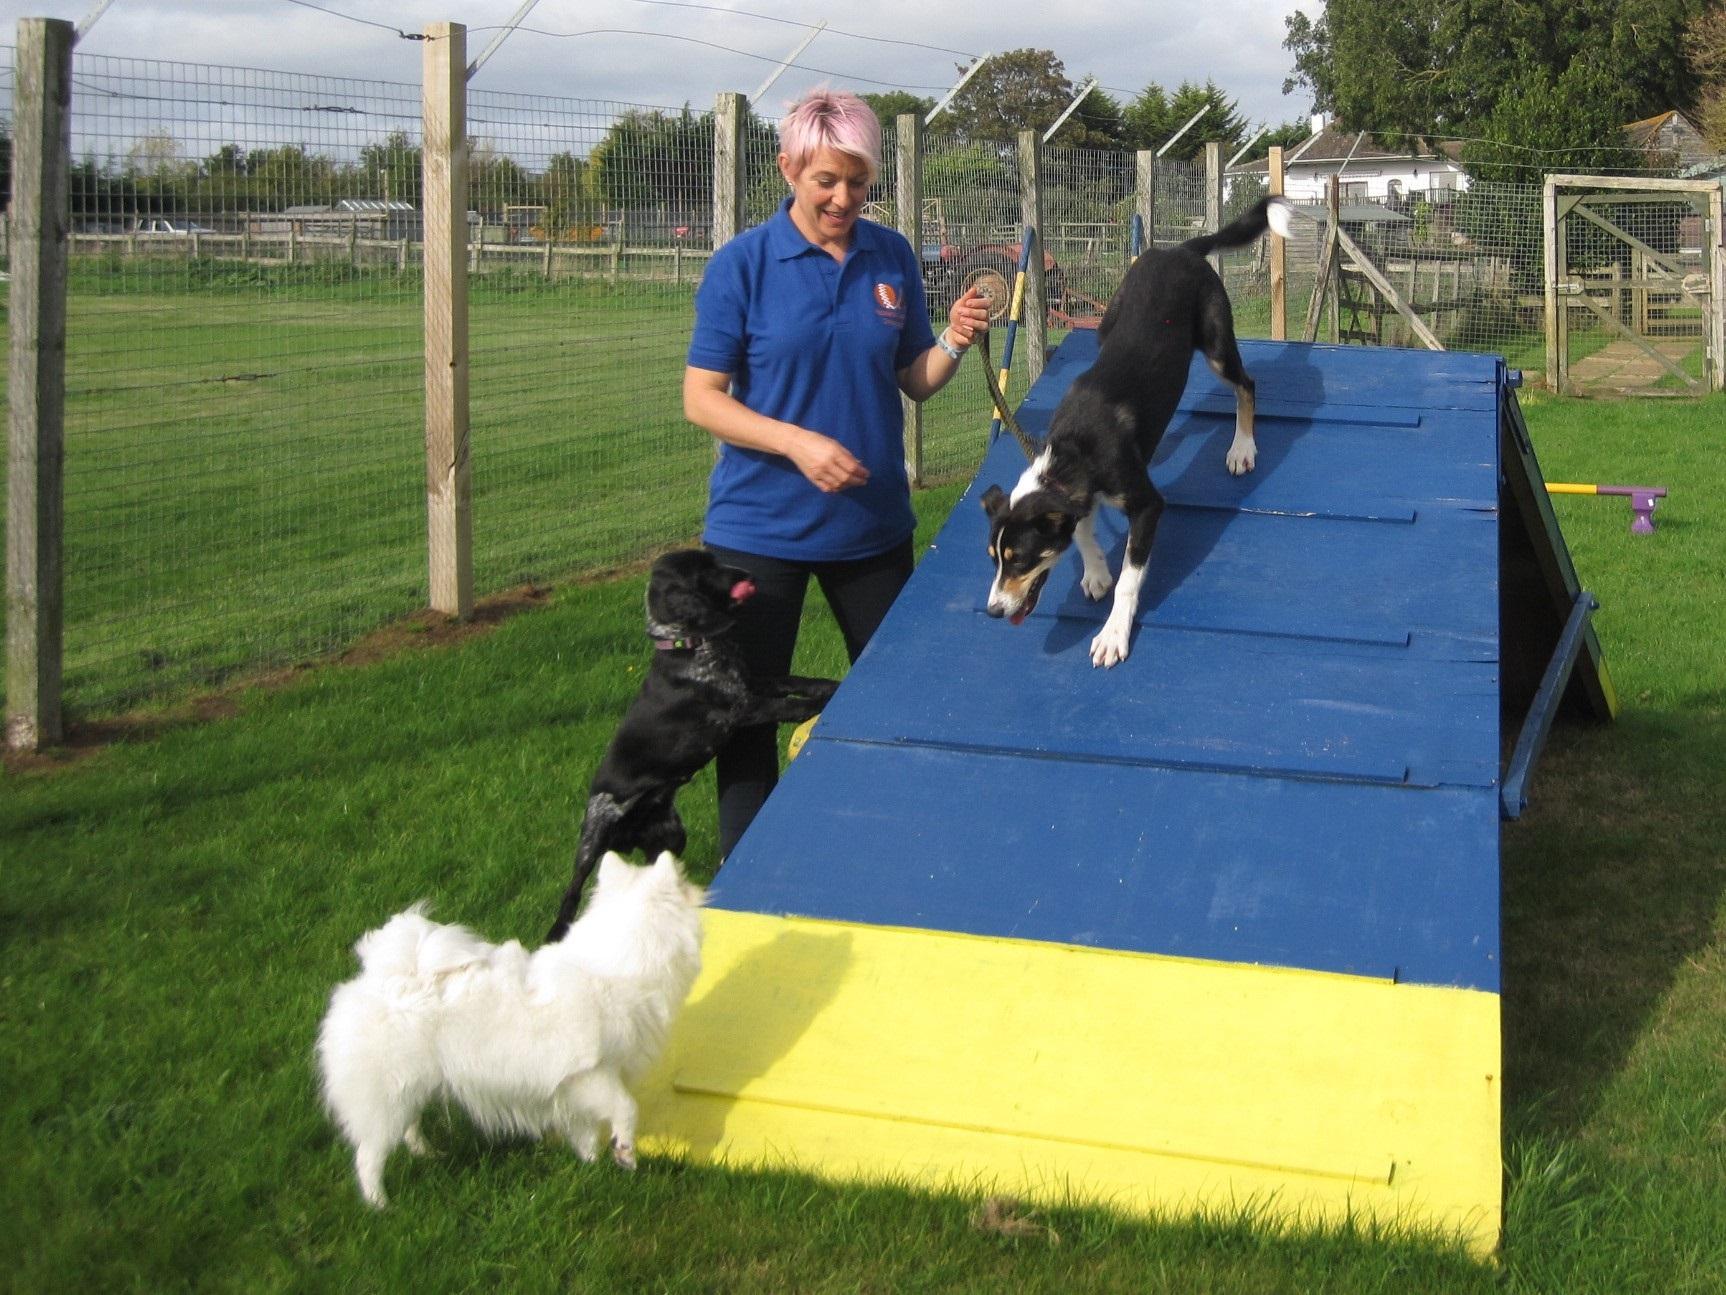 Dog agility A frame - Charney Pet Care Centre